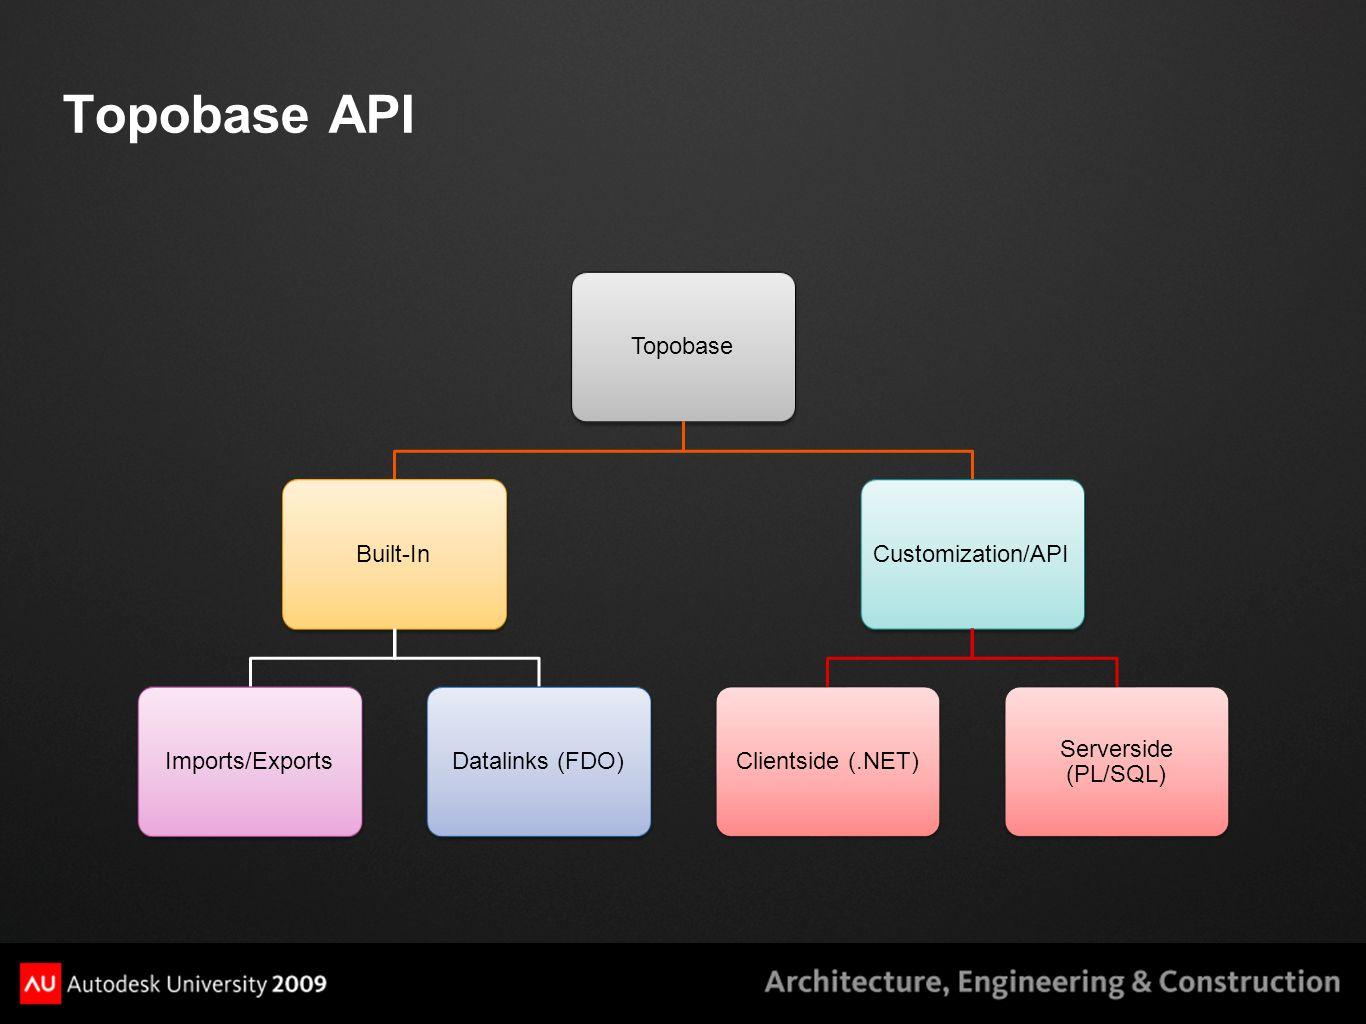 Topobase API TopobaseBuilt-InImports/ExportsDatalinks (FDO)Customization/APIClientside (.NET) Serverside (PL/SQL)